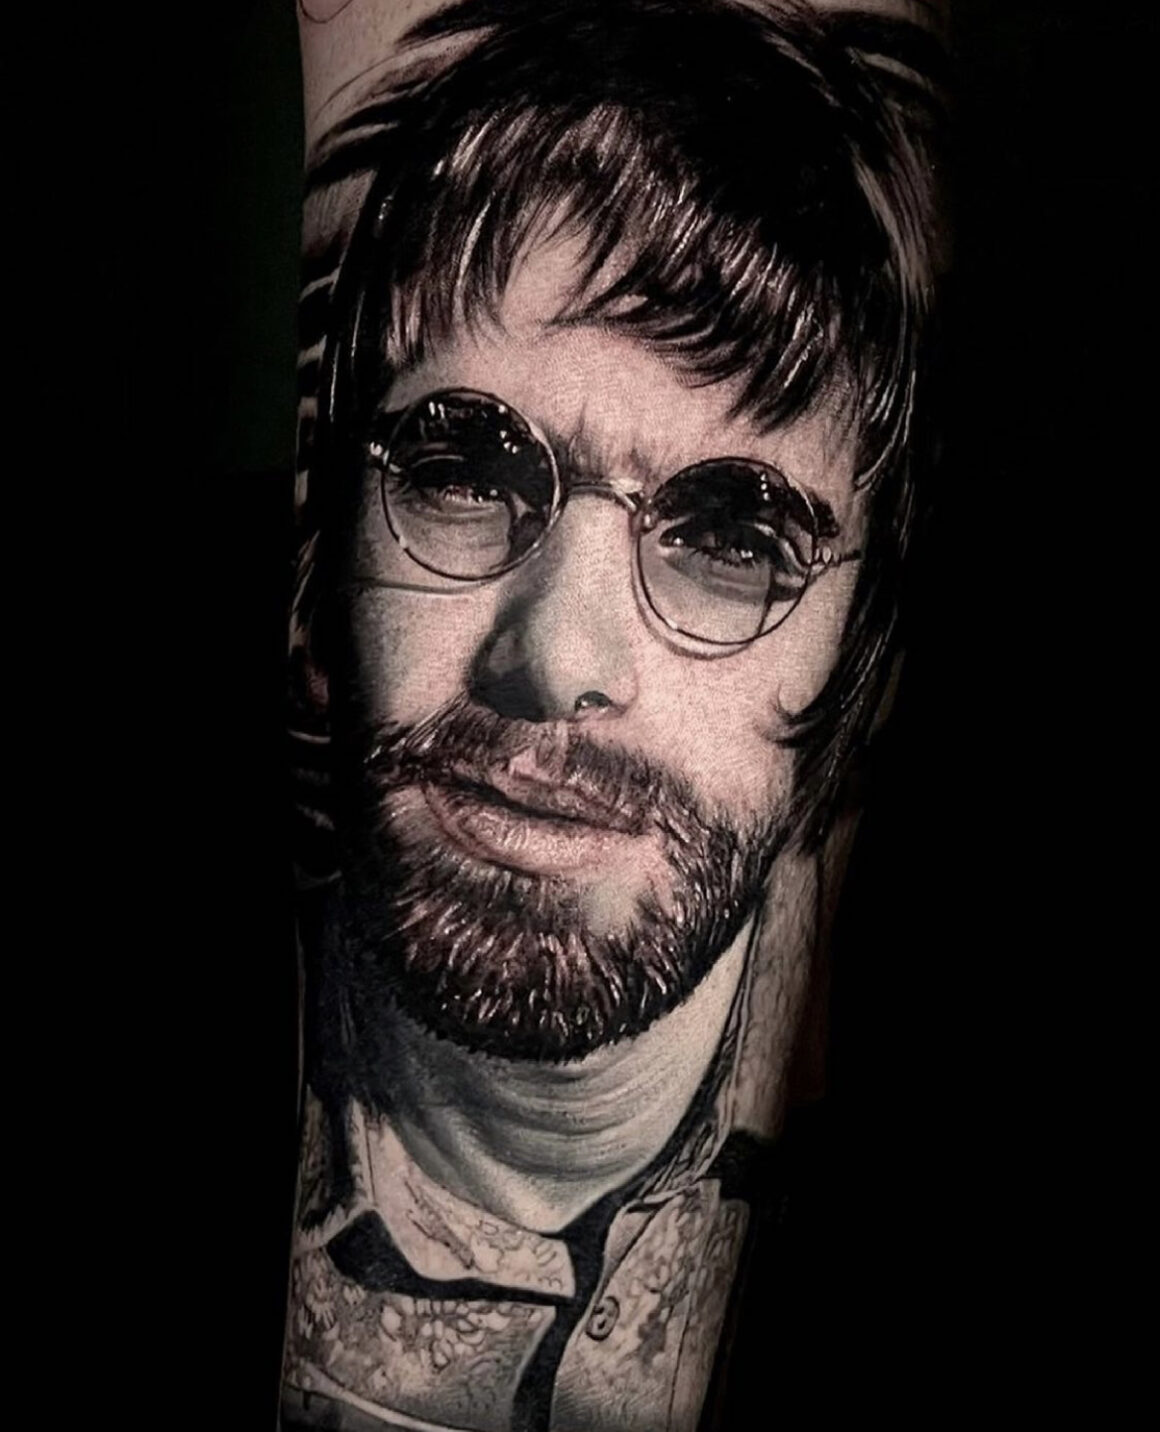 Tattoo by Giuseppe Gobi Bonelli @giuseppe_gobi_bonelli